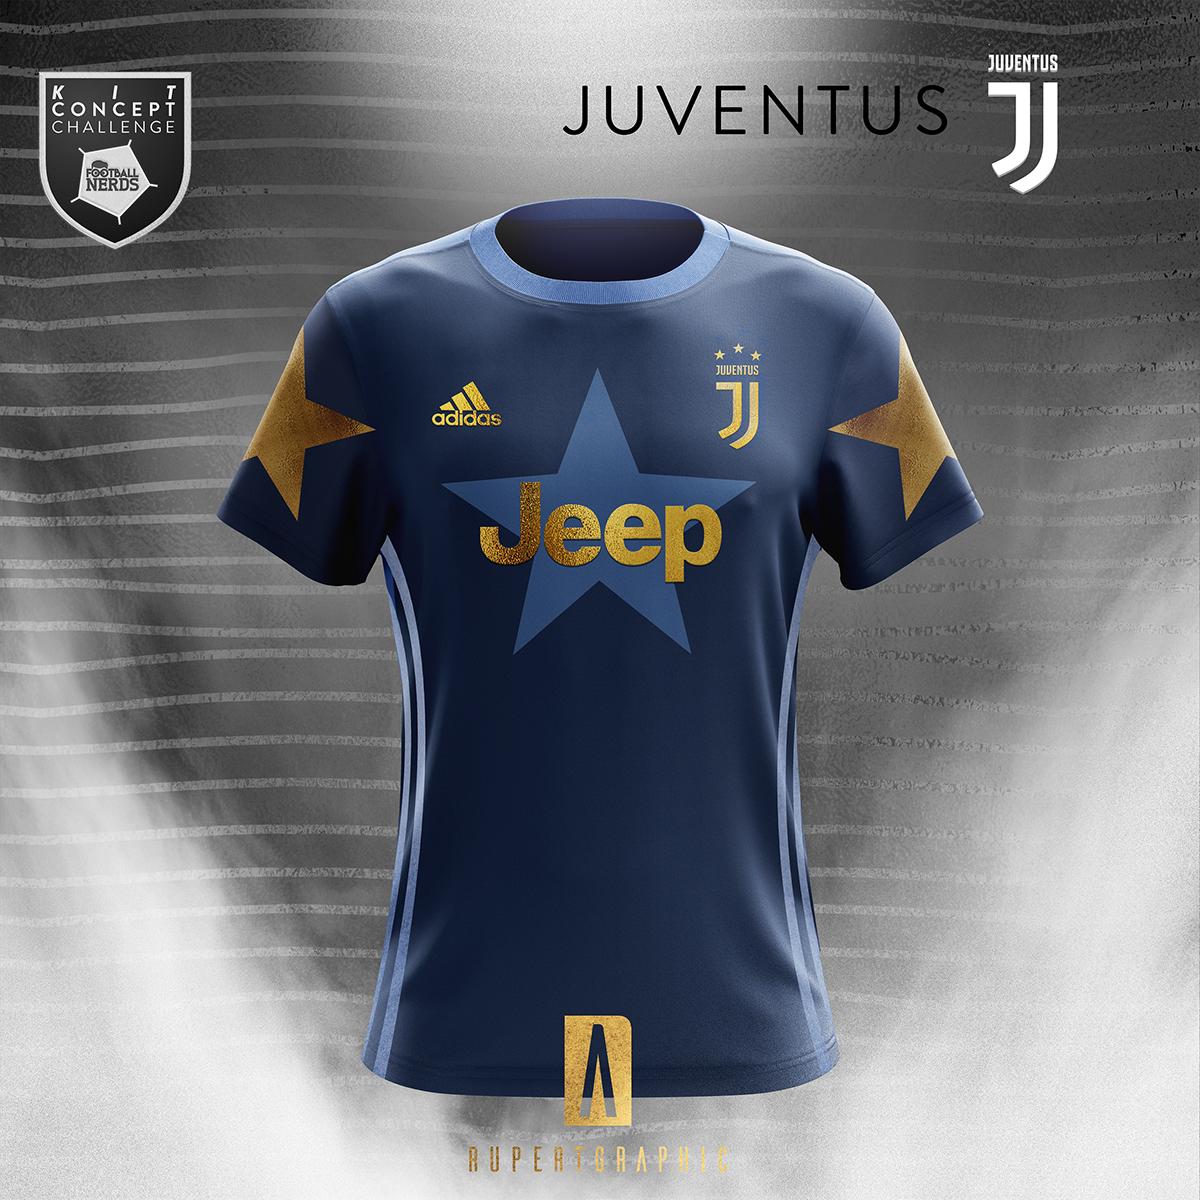 0f35edb56 Juventus Concept 2018 19 - Adidas on Pantone Canvas Gallery